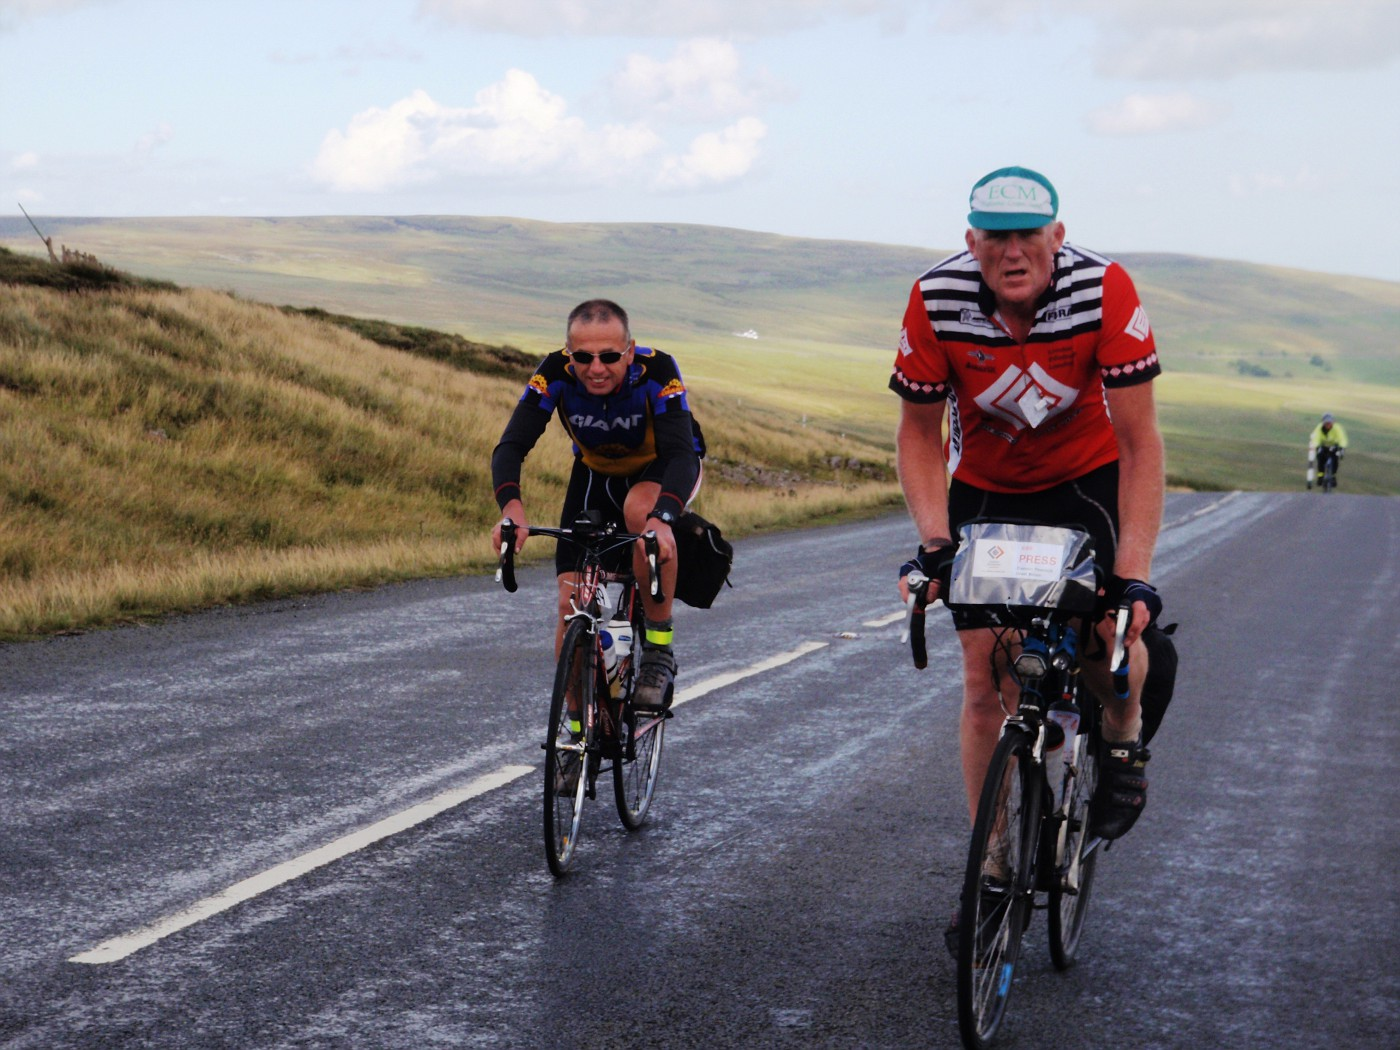 The British cyclesports reporter Damon